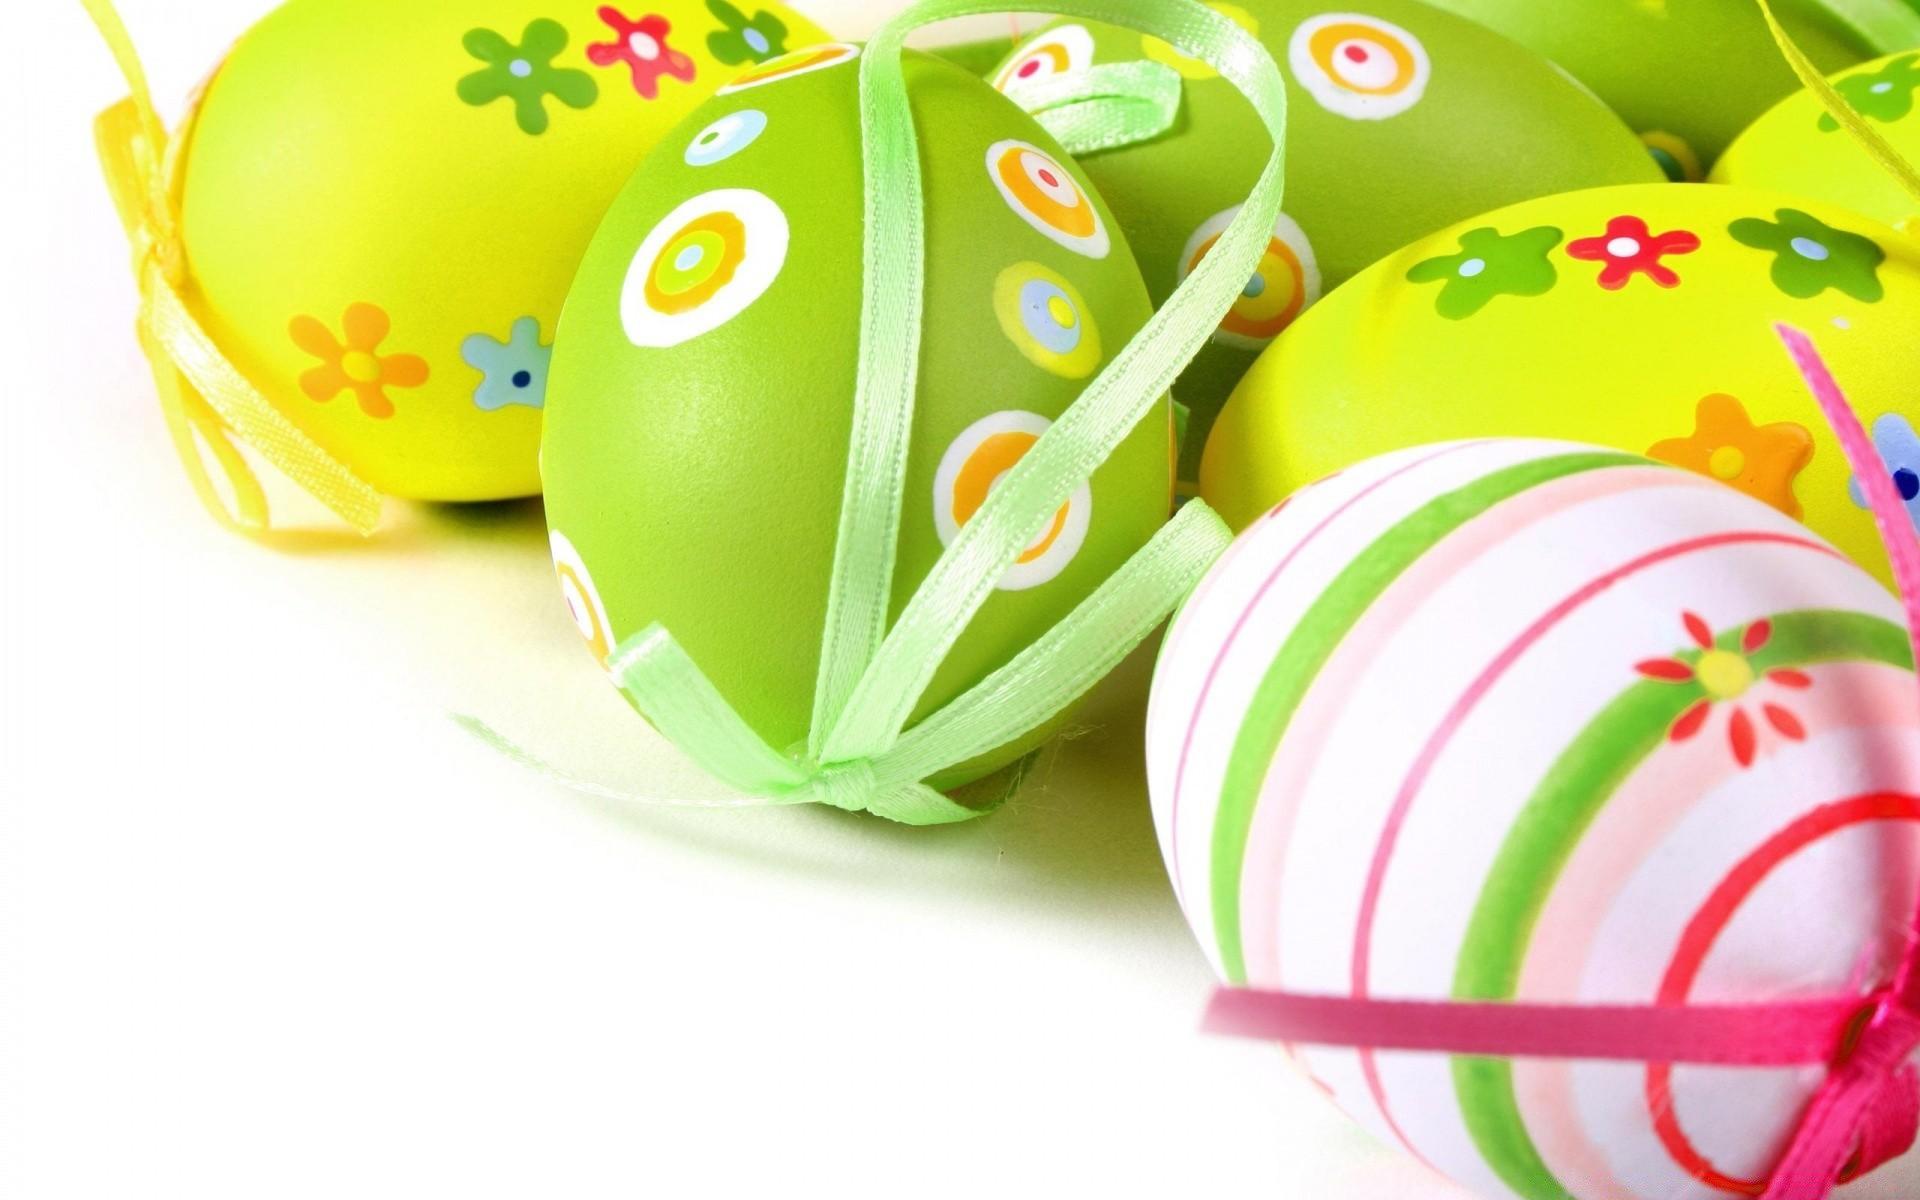 Easter Eggs Macro Desktop Wallpapers For Free